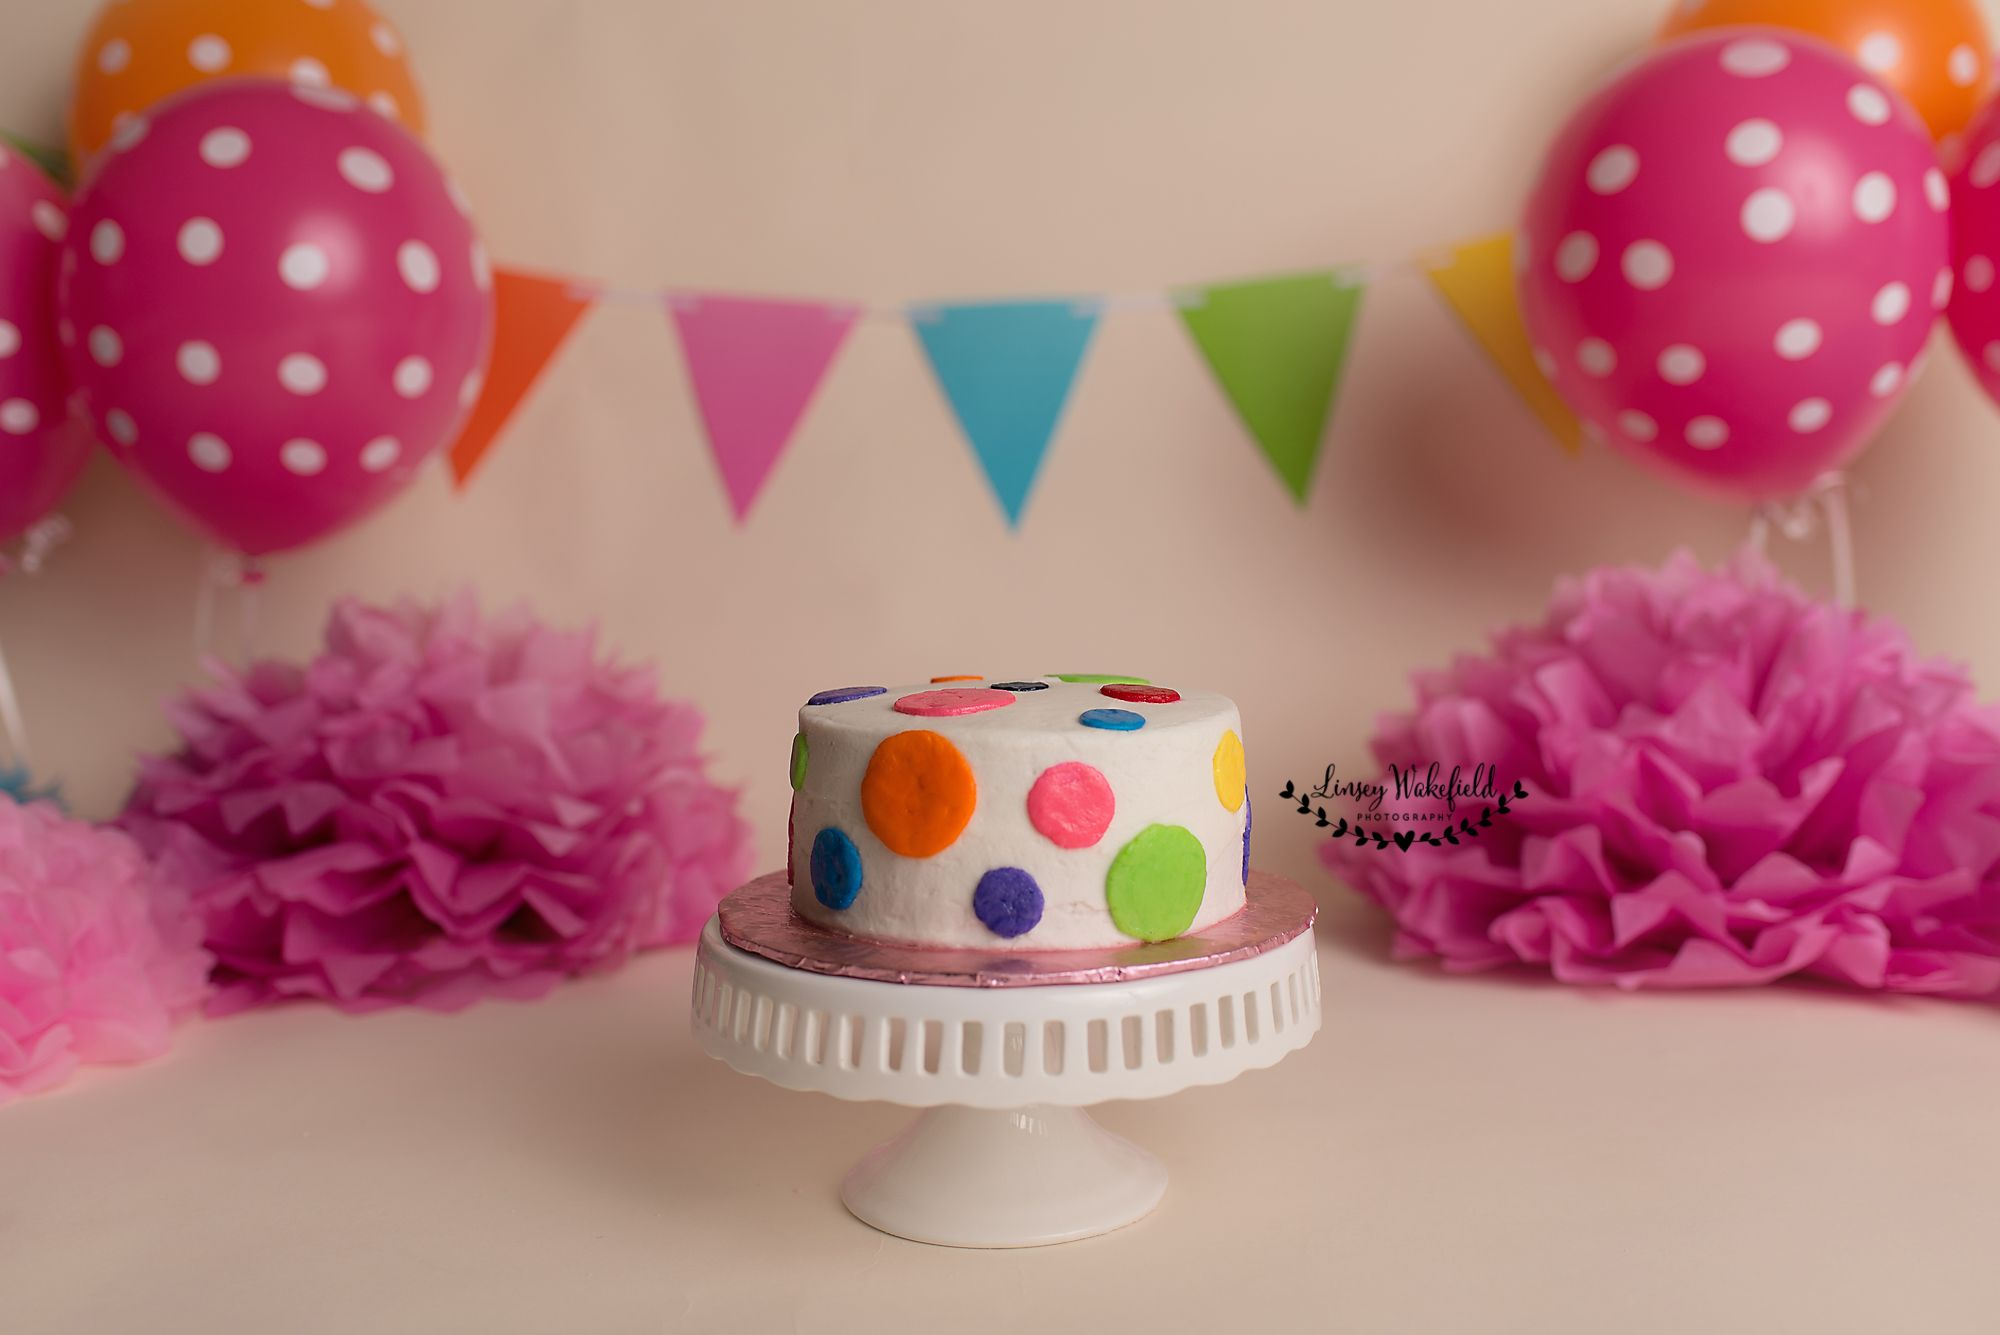 cake smash, cake smash session, colorful cake smash, first